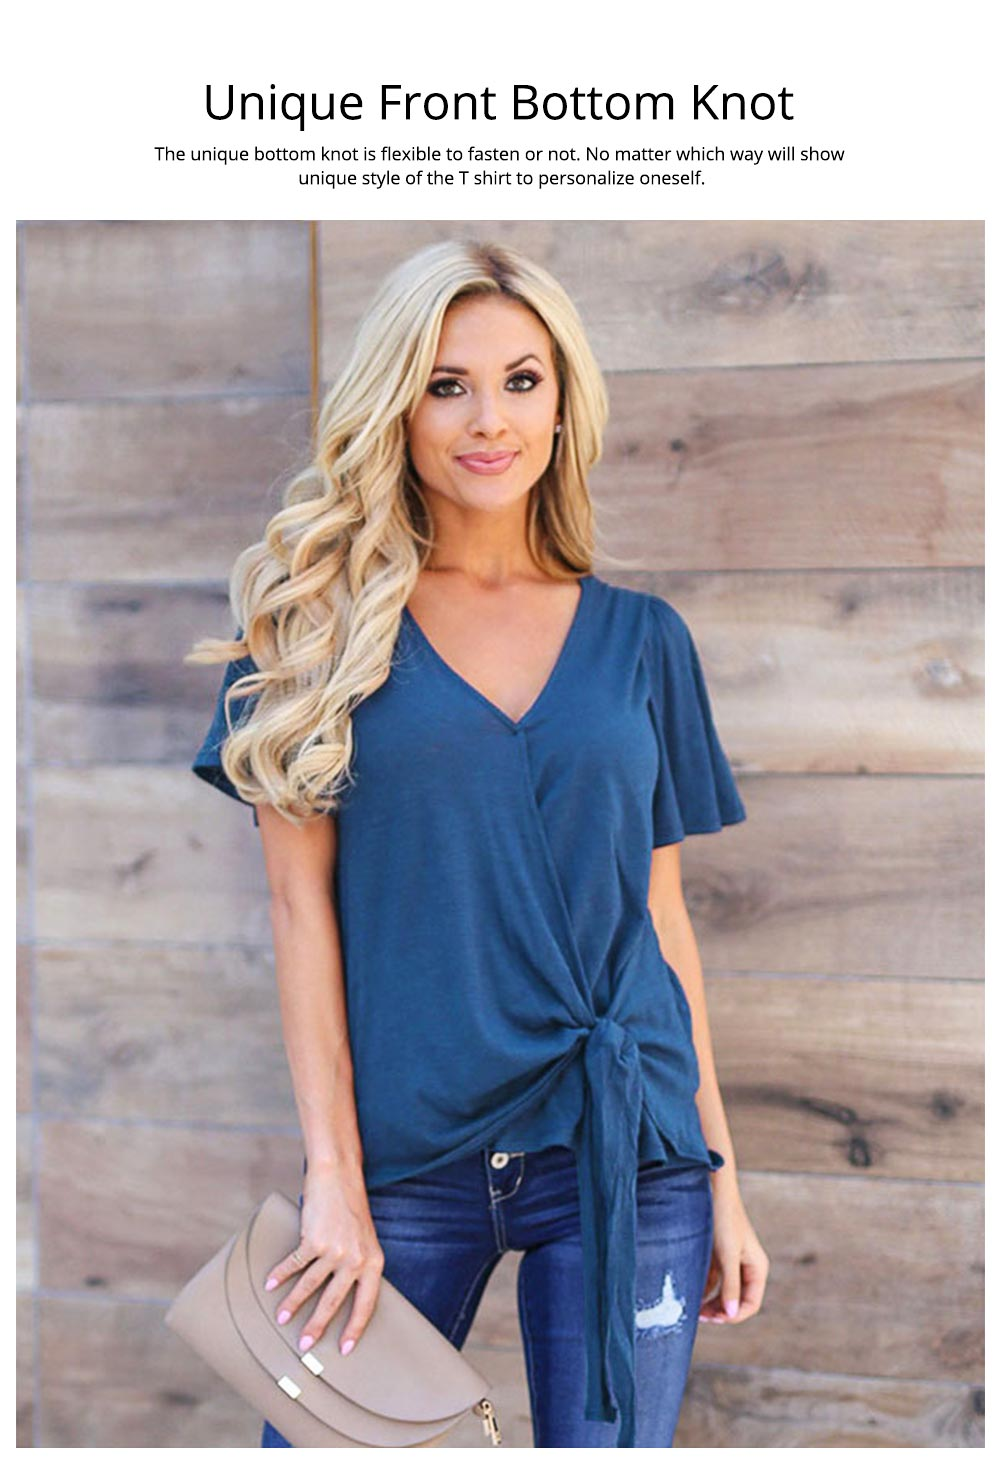 V-neck Lower T-shirt for Women in Summer 2019, Short Sleeve Hem Tying Knot Tees, Women Loose Top Dress 5